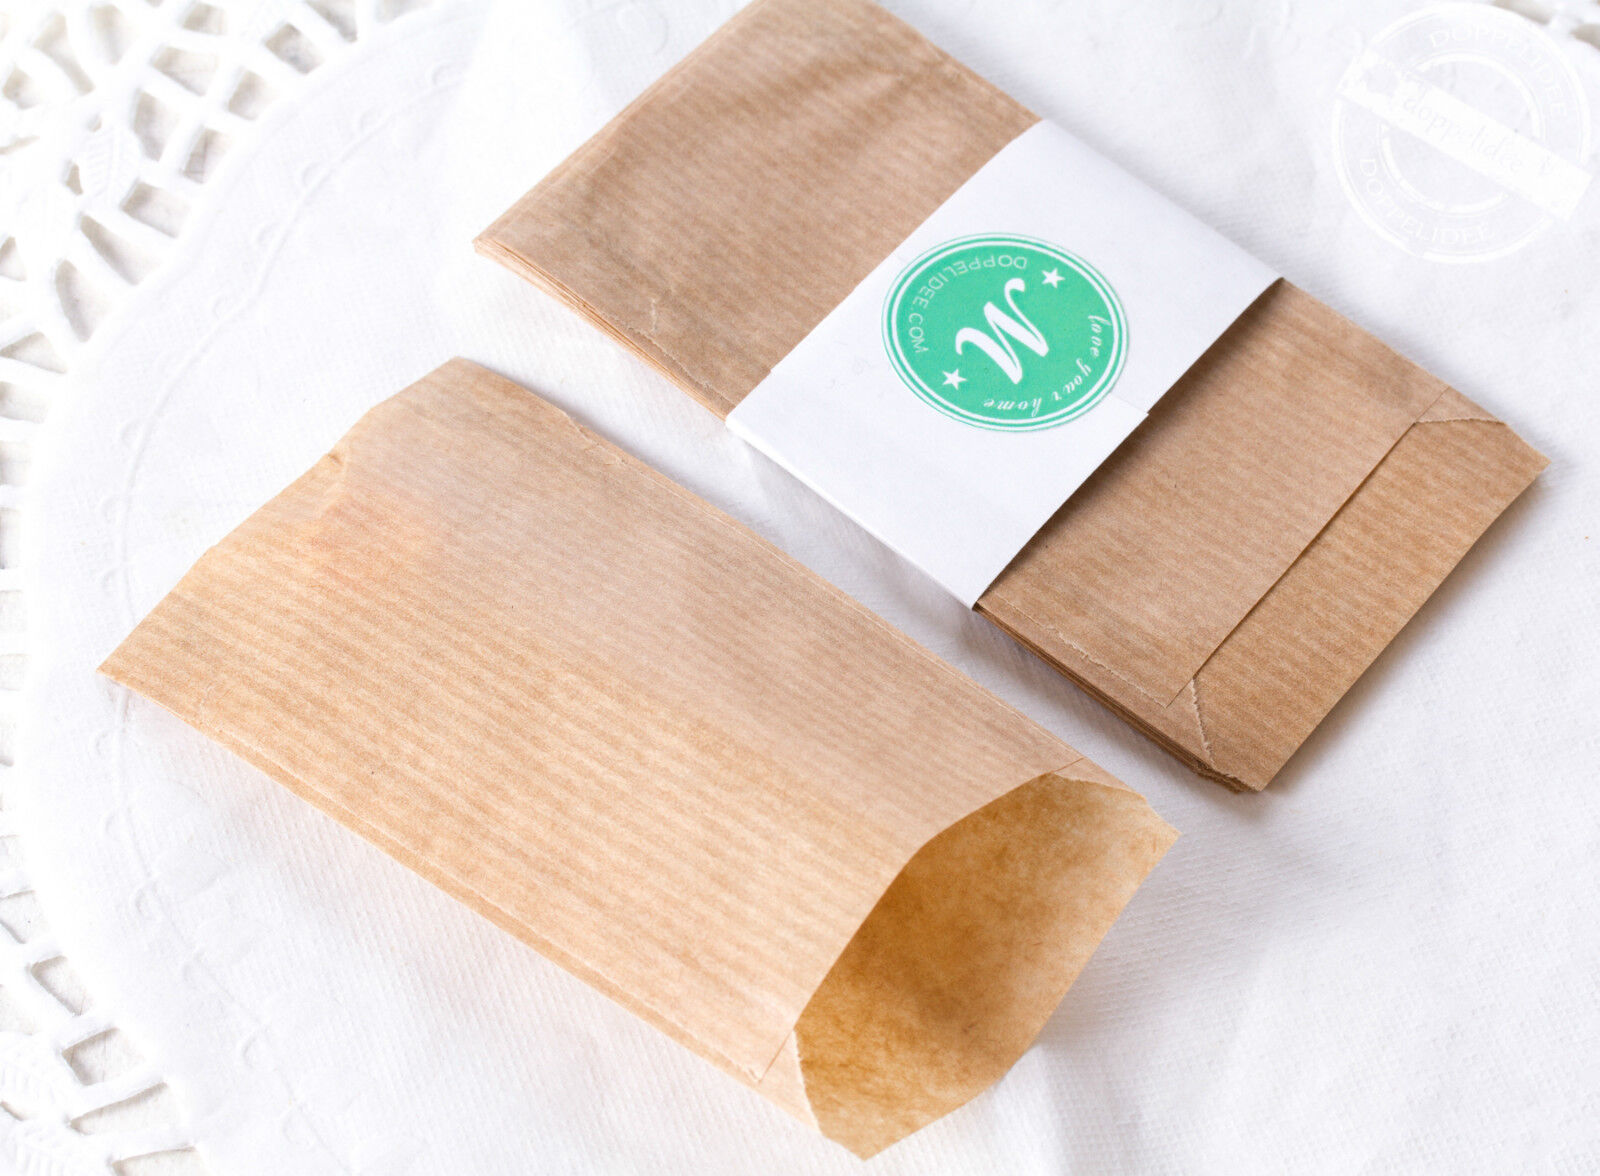 20 mini Kraftpapier FLACHBEUTEL Geschenktüten Papiertüten Papier Tüten Tütchen